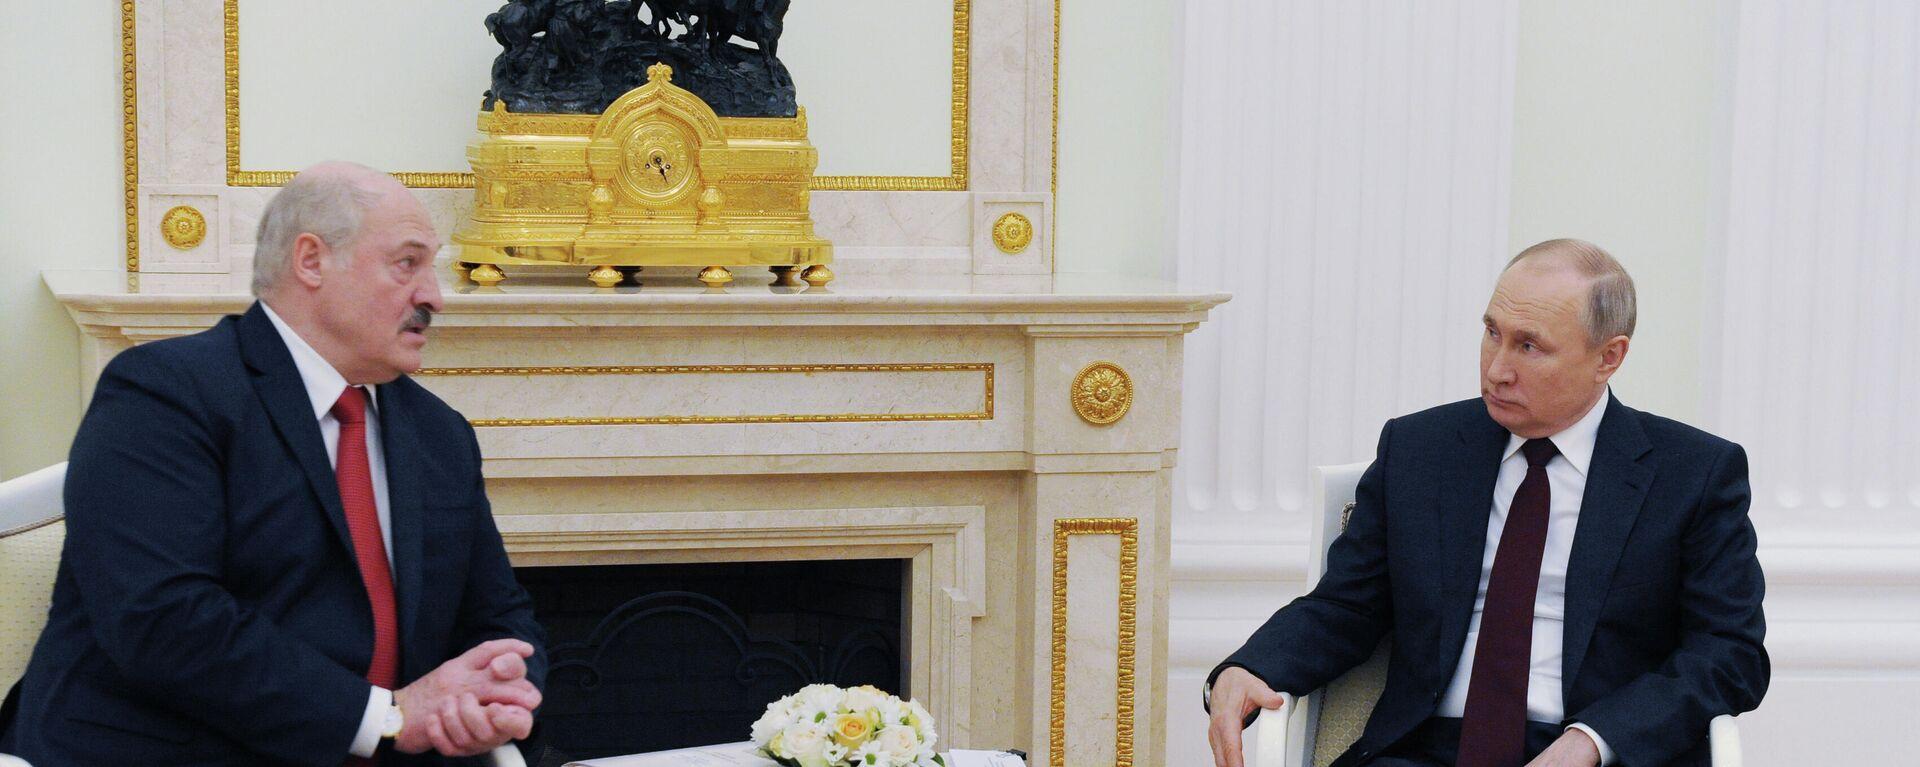 Президент РФ В. Путин встретился с президентом Белоруссии А. Лукашенко - Sputnik Таджикистан, 1920, 28.05.2021